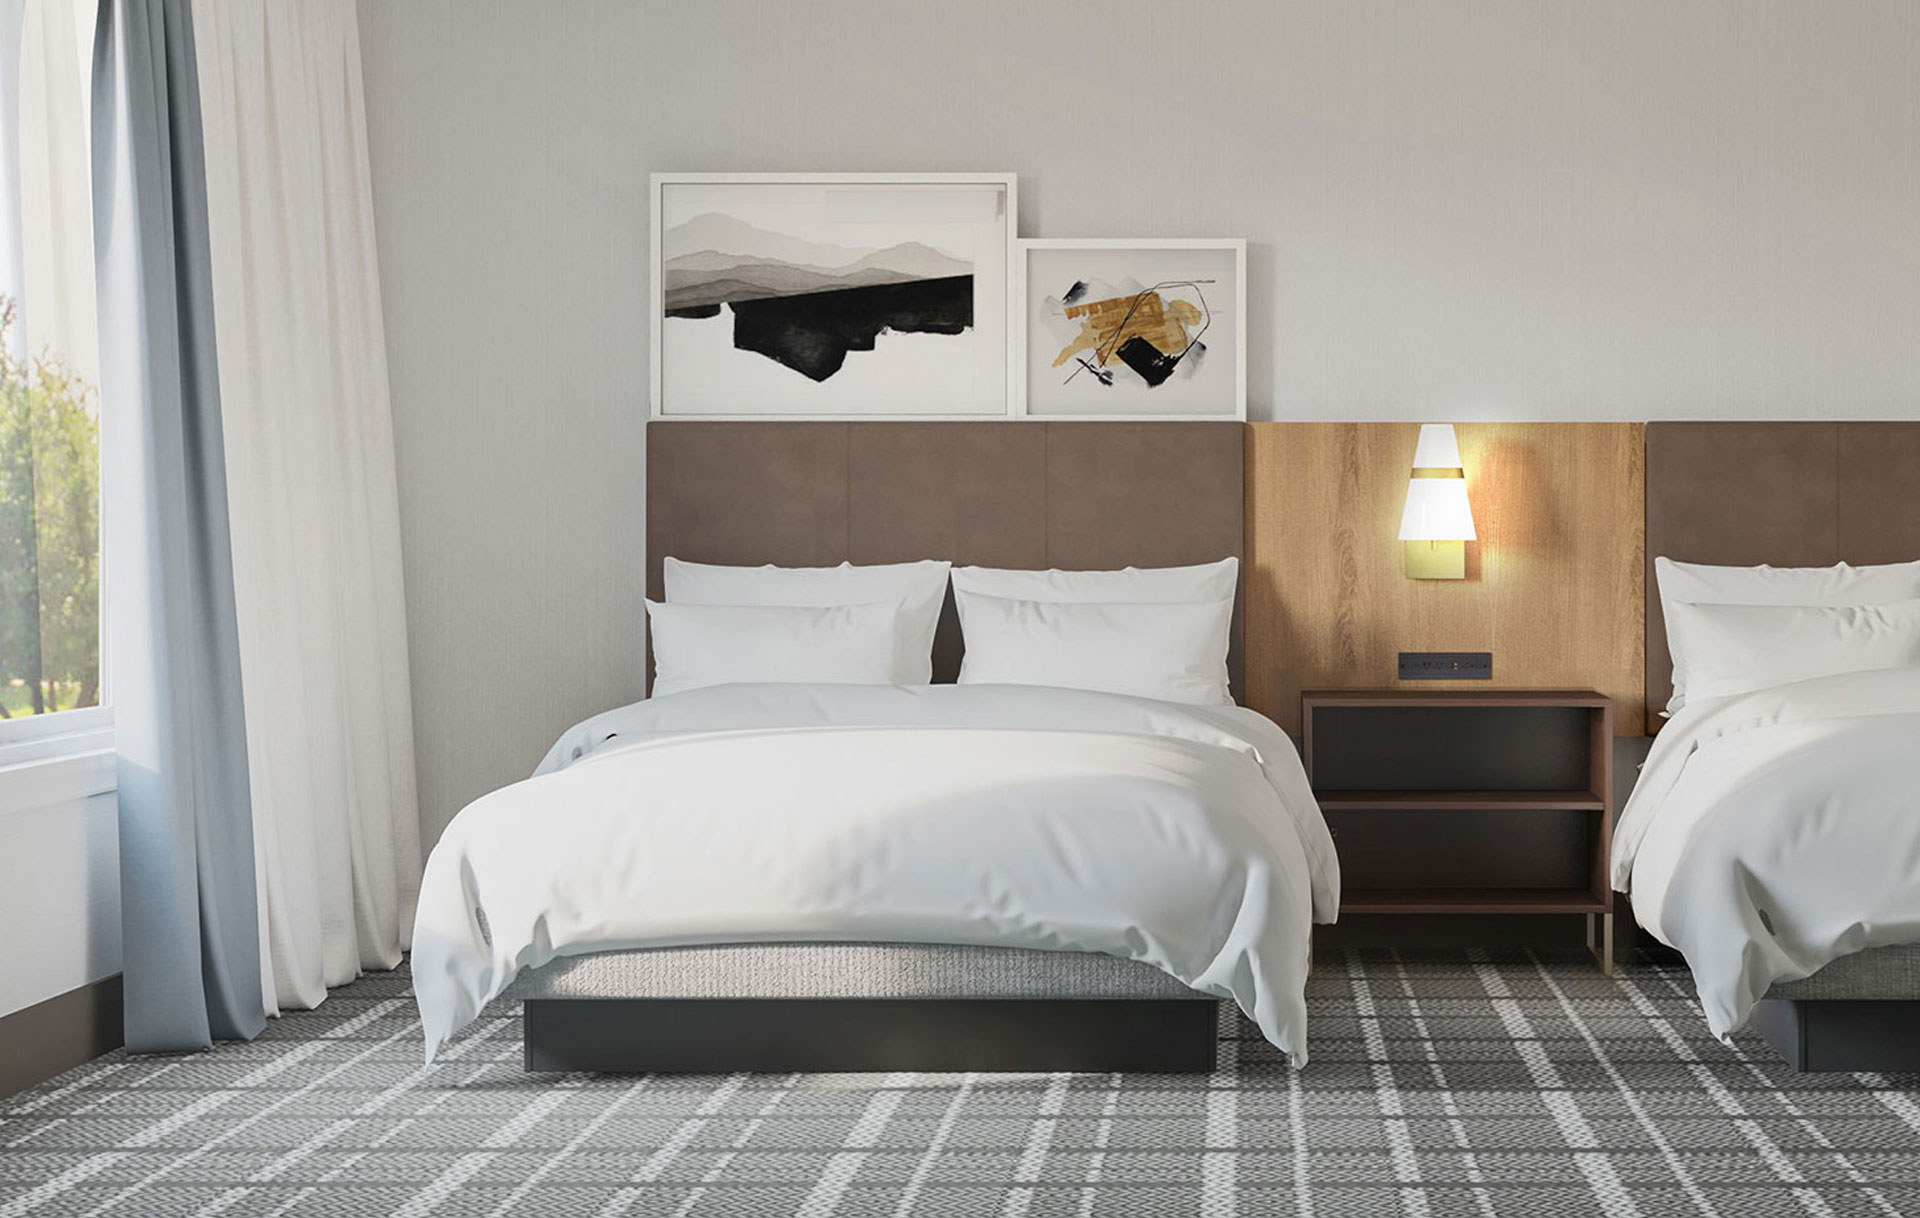 Staybridge Suites Beds